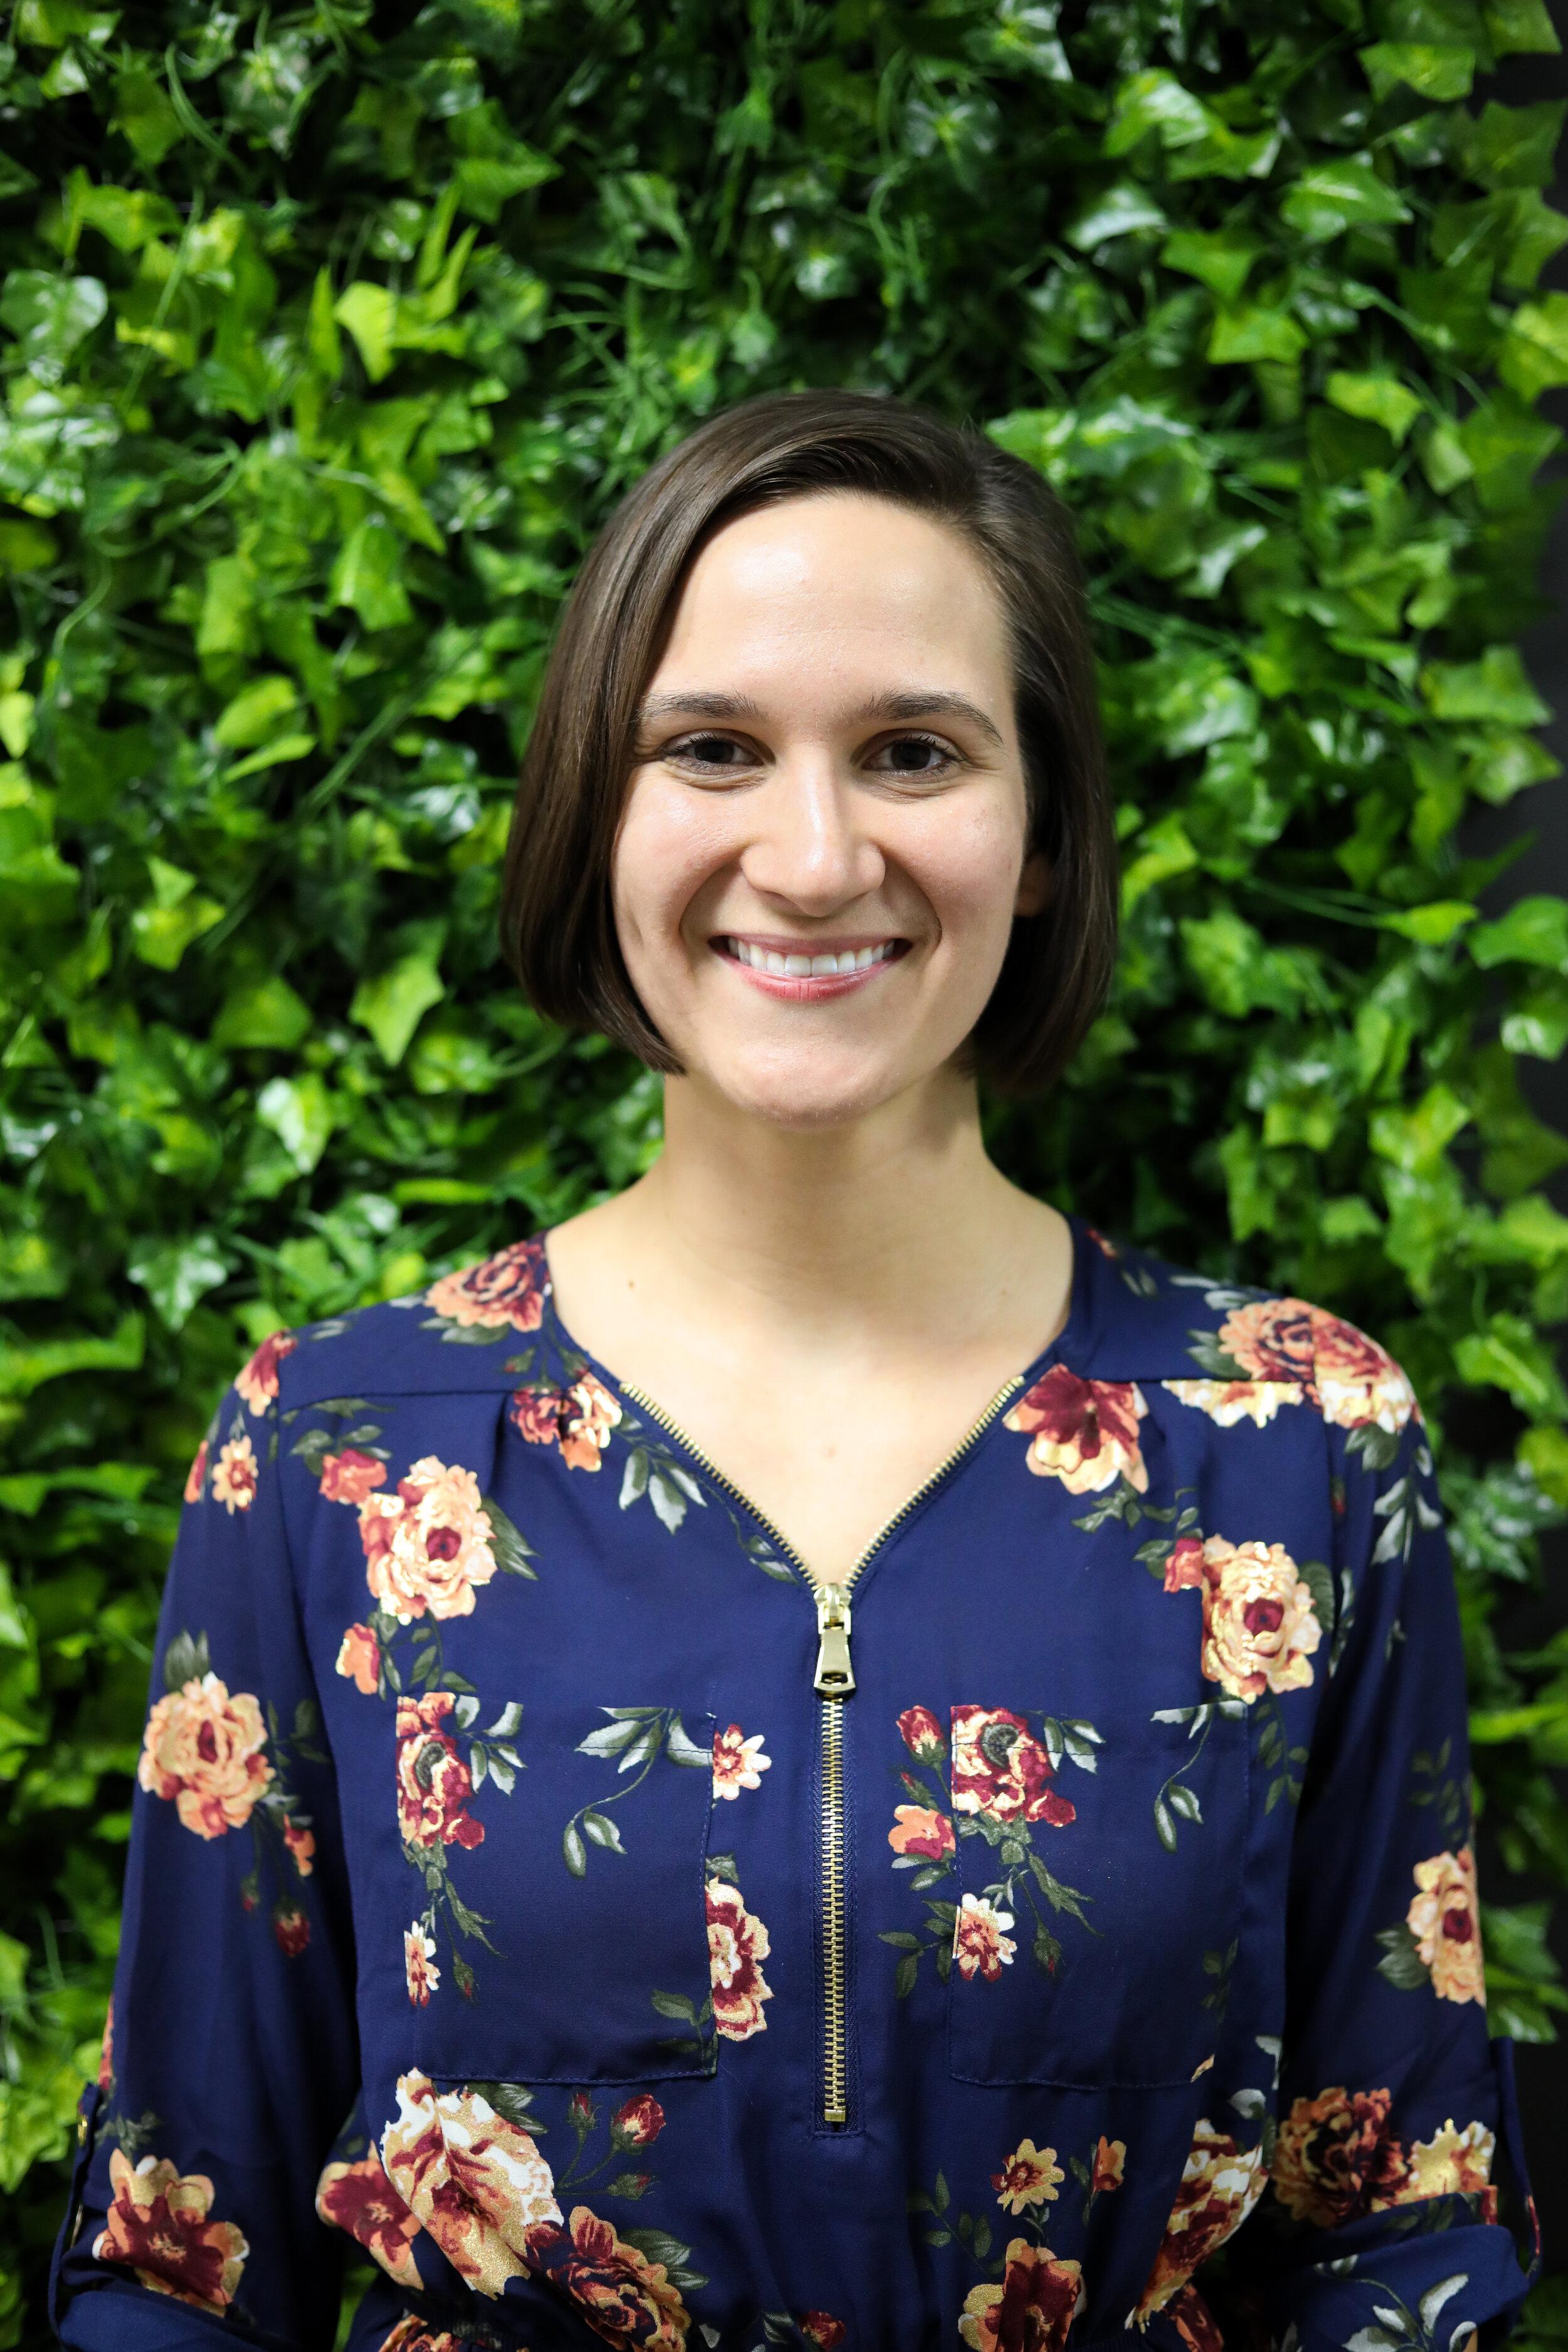 Michelle Voran // Women's Discipleship Director // Michelle@dcctally.com